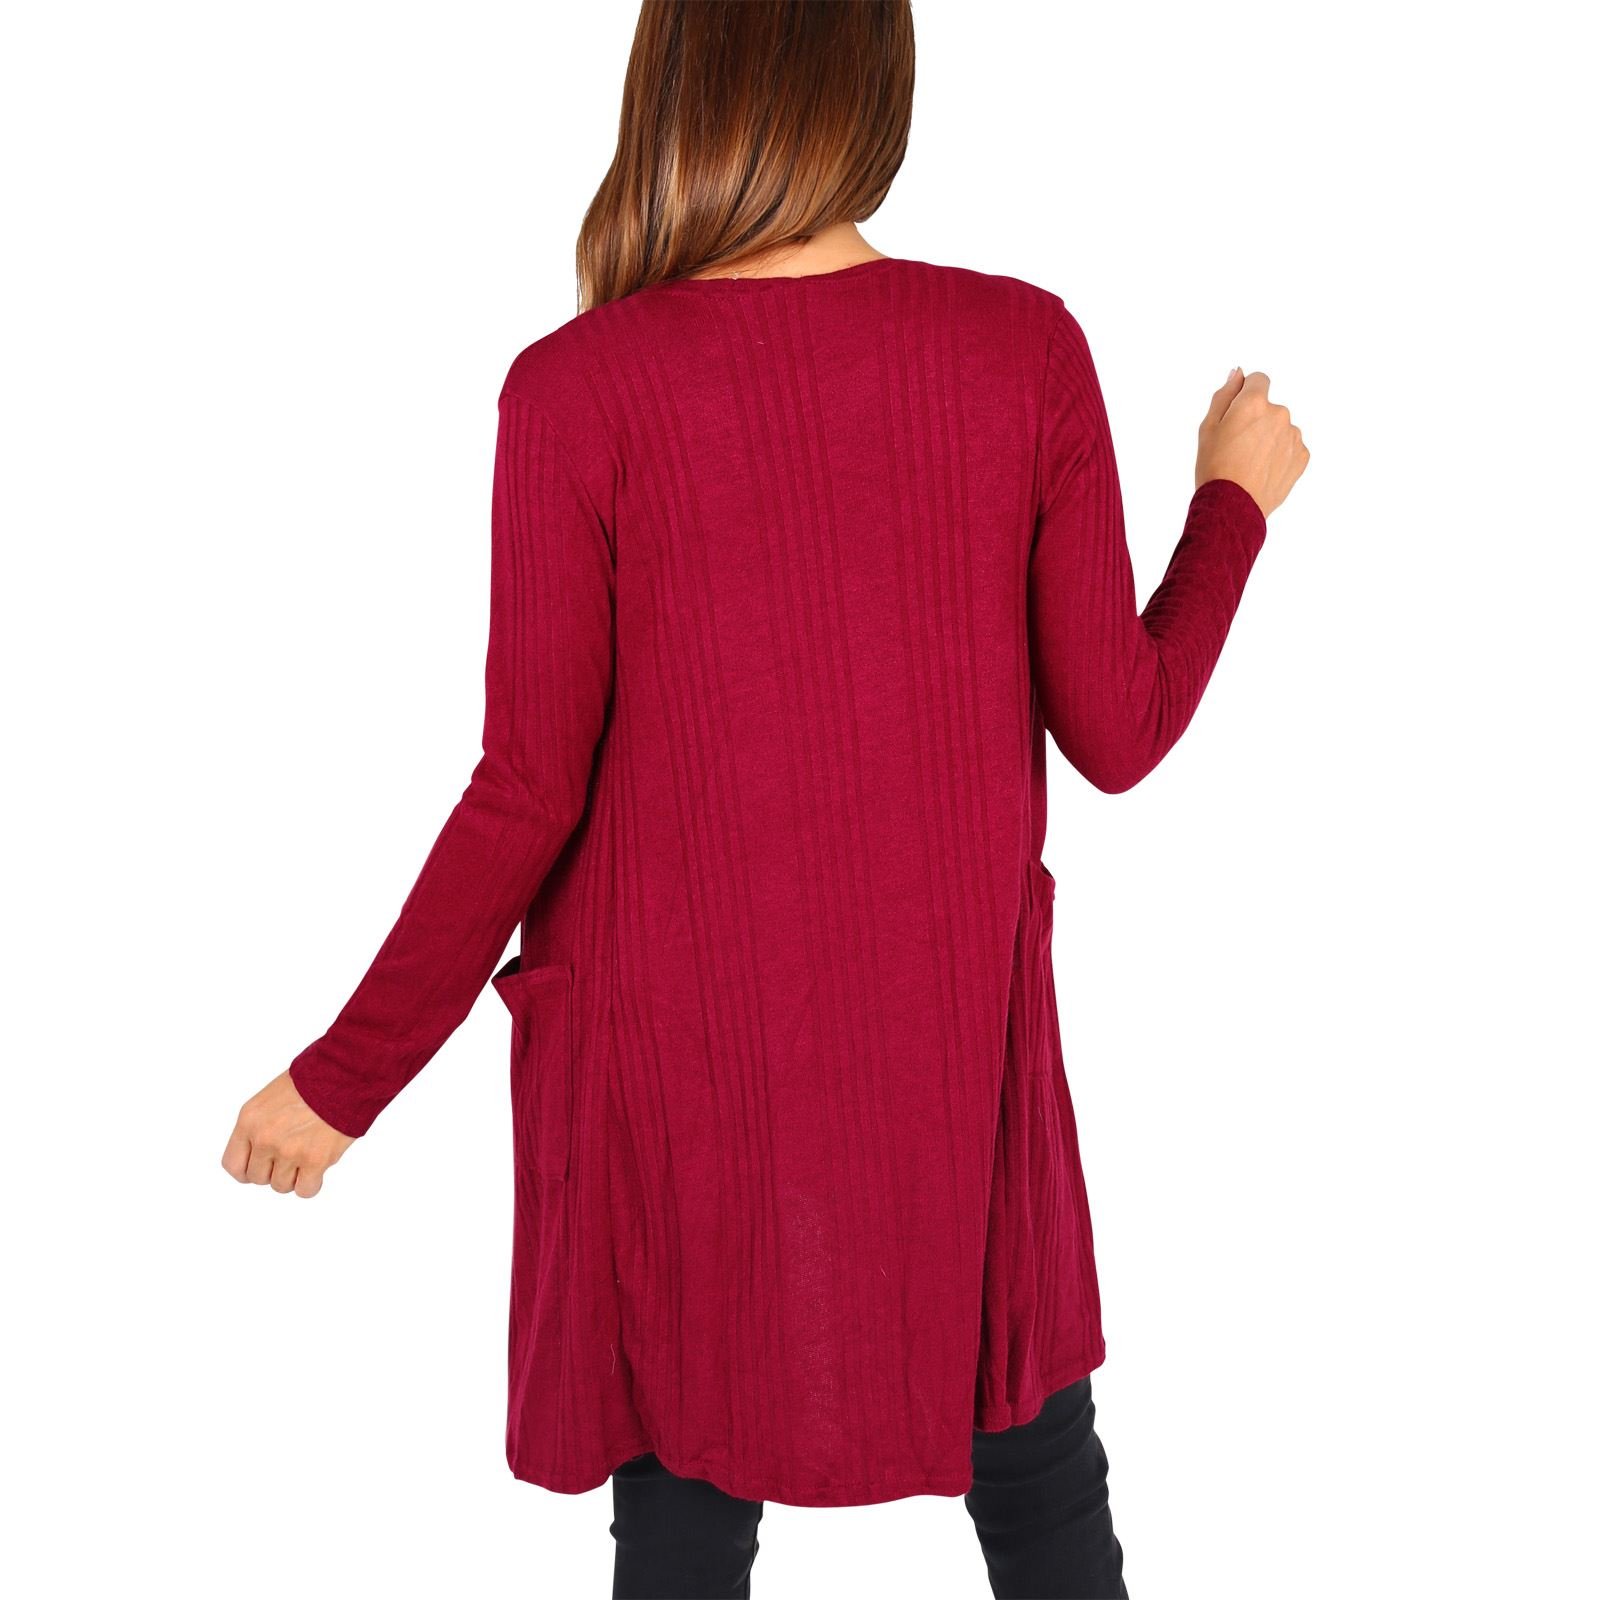 Femmes-Cardigan-Gilet-Long-Manches-Longues-Elegant-Mode-Basique-Casual-Jumper miniature 3